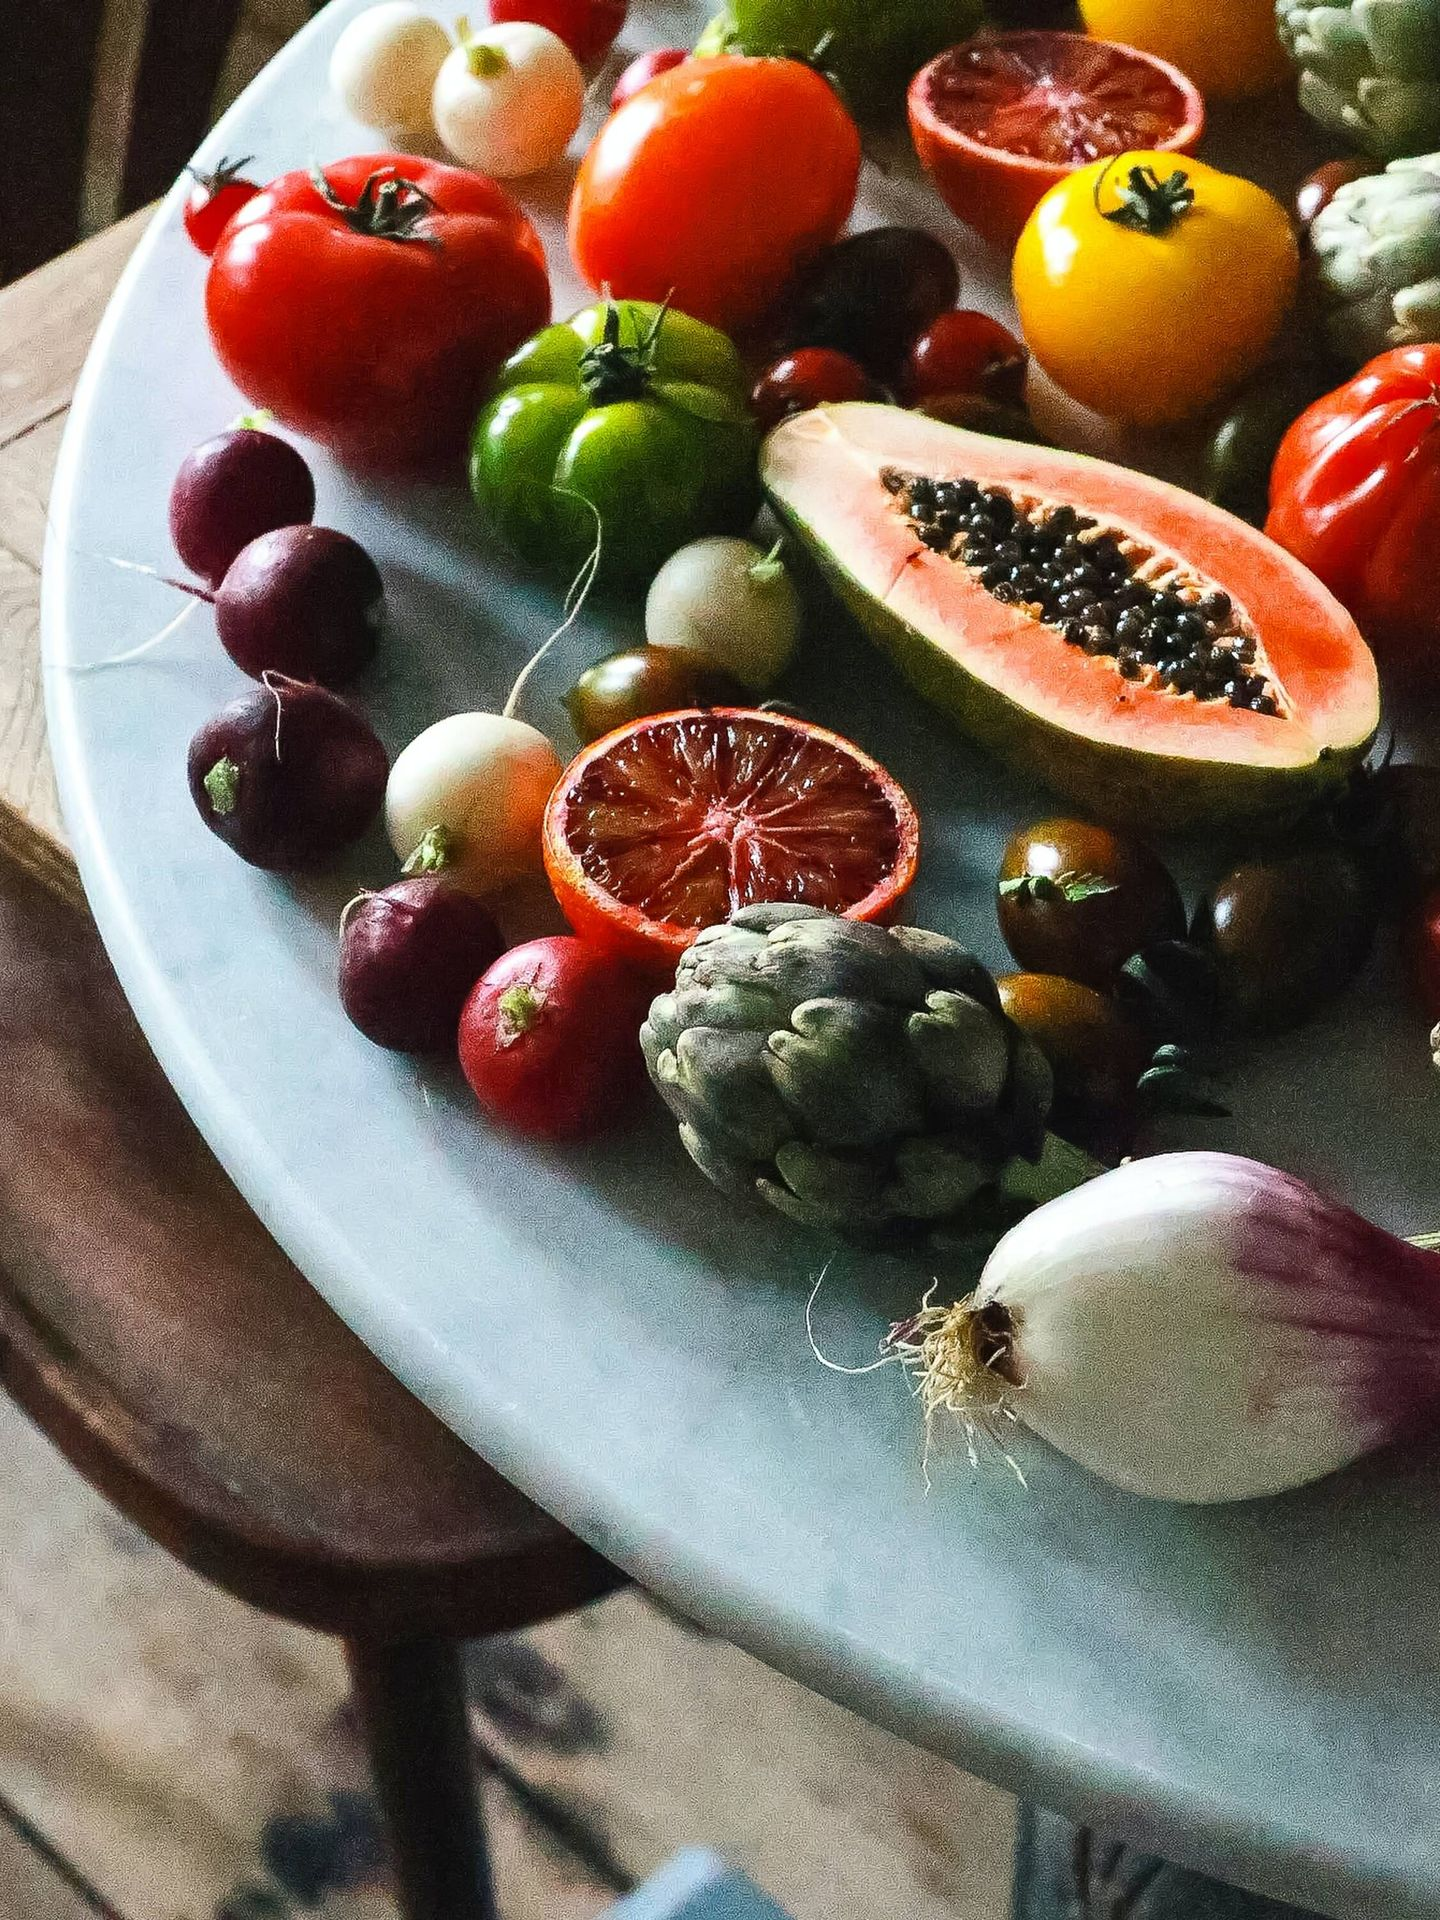 Dieta cardiosaludable para mejorar tu salud. (Geraud pfeiffer para Pexels)